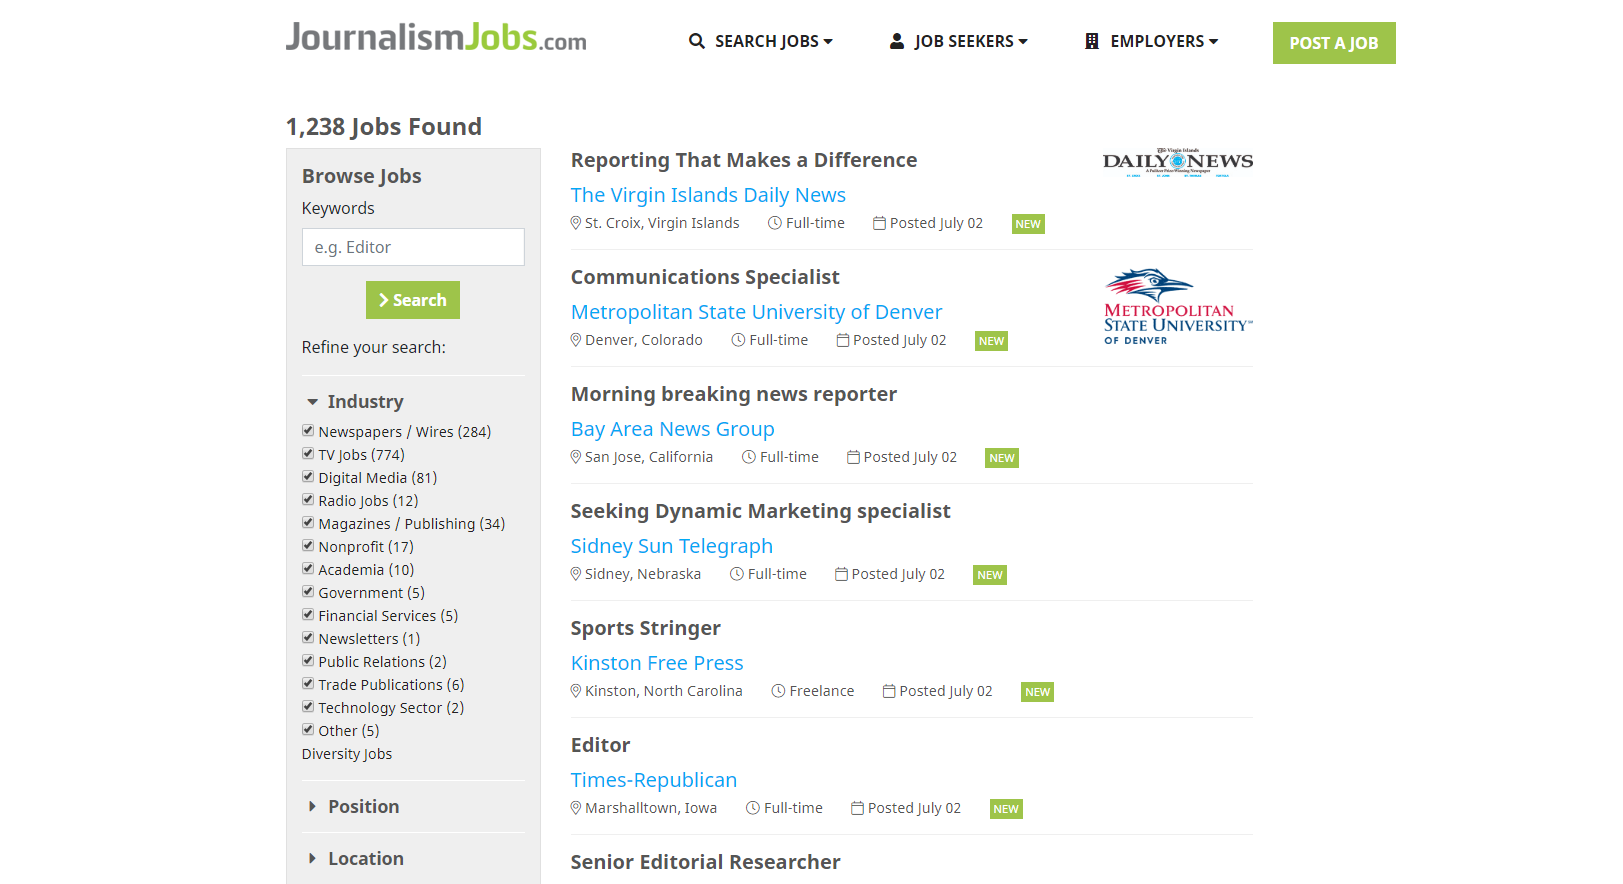 Journalism Jobs listing